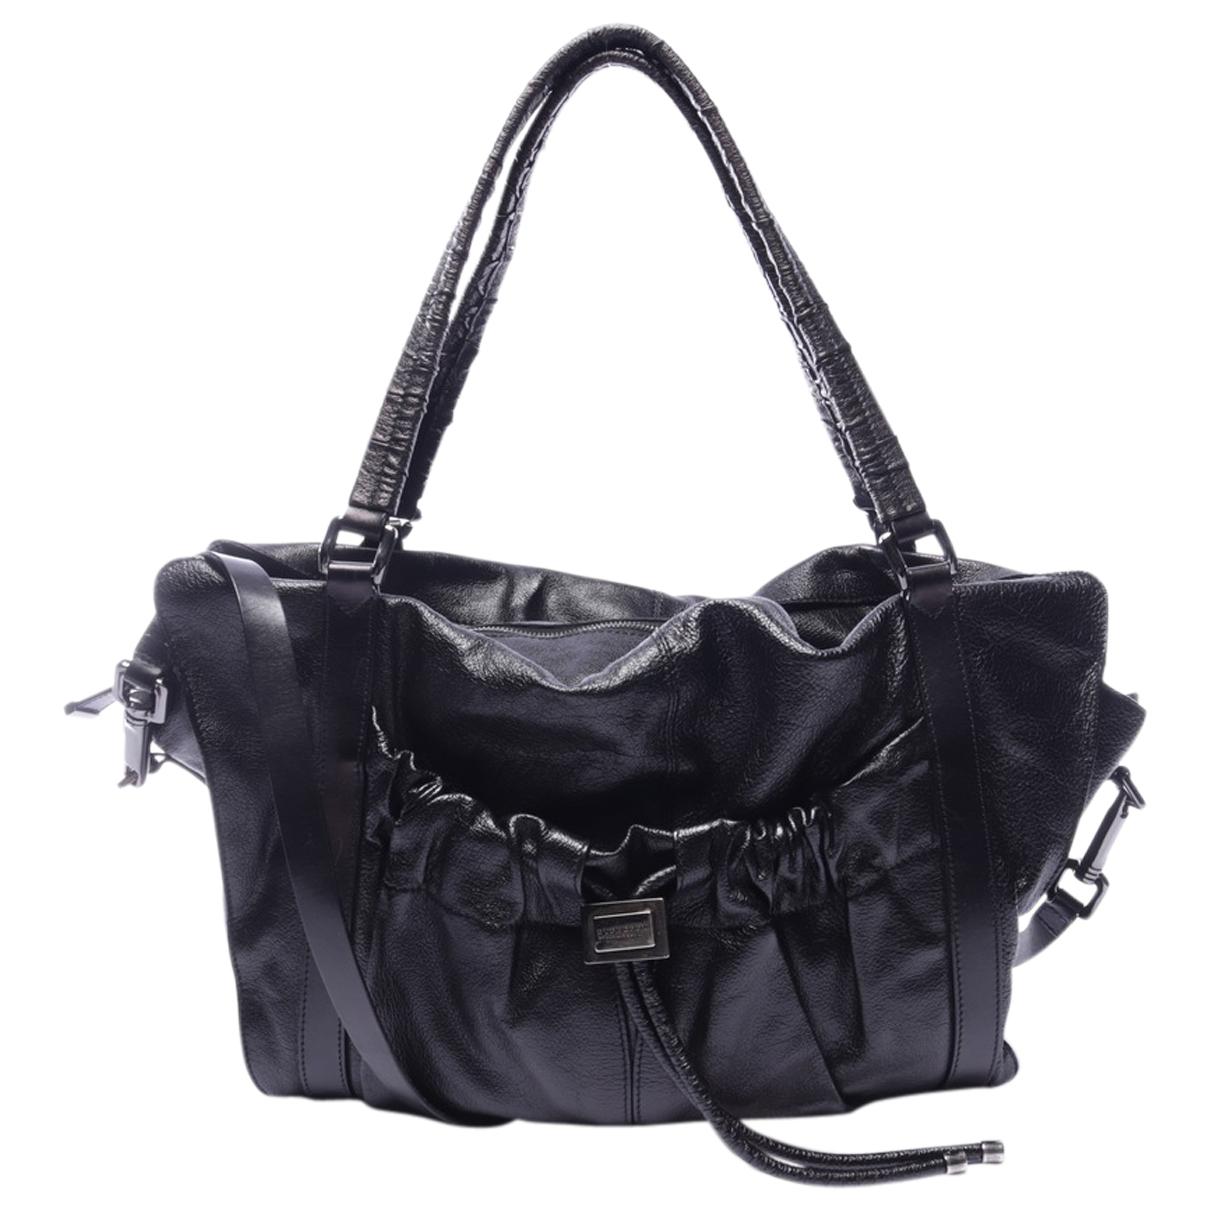 Burberry \N Handtasche in  Schwarz Leder